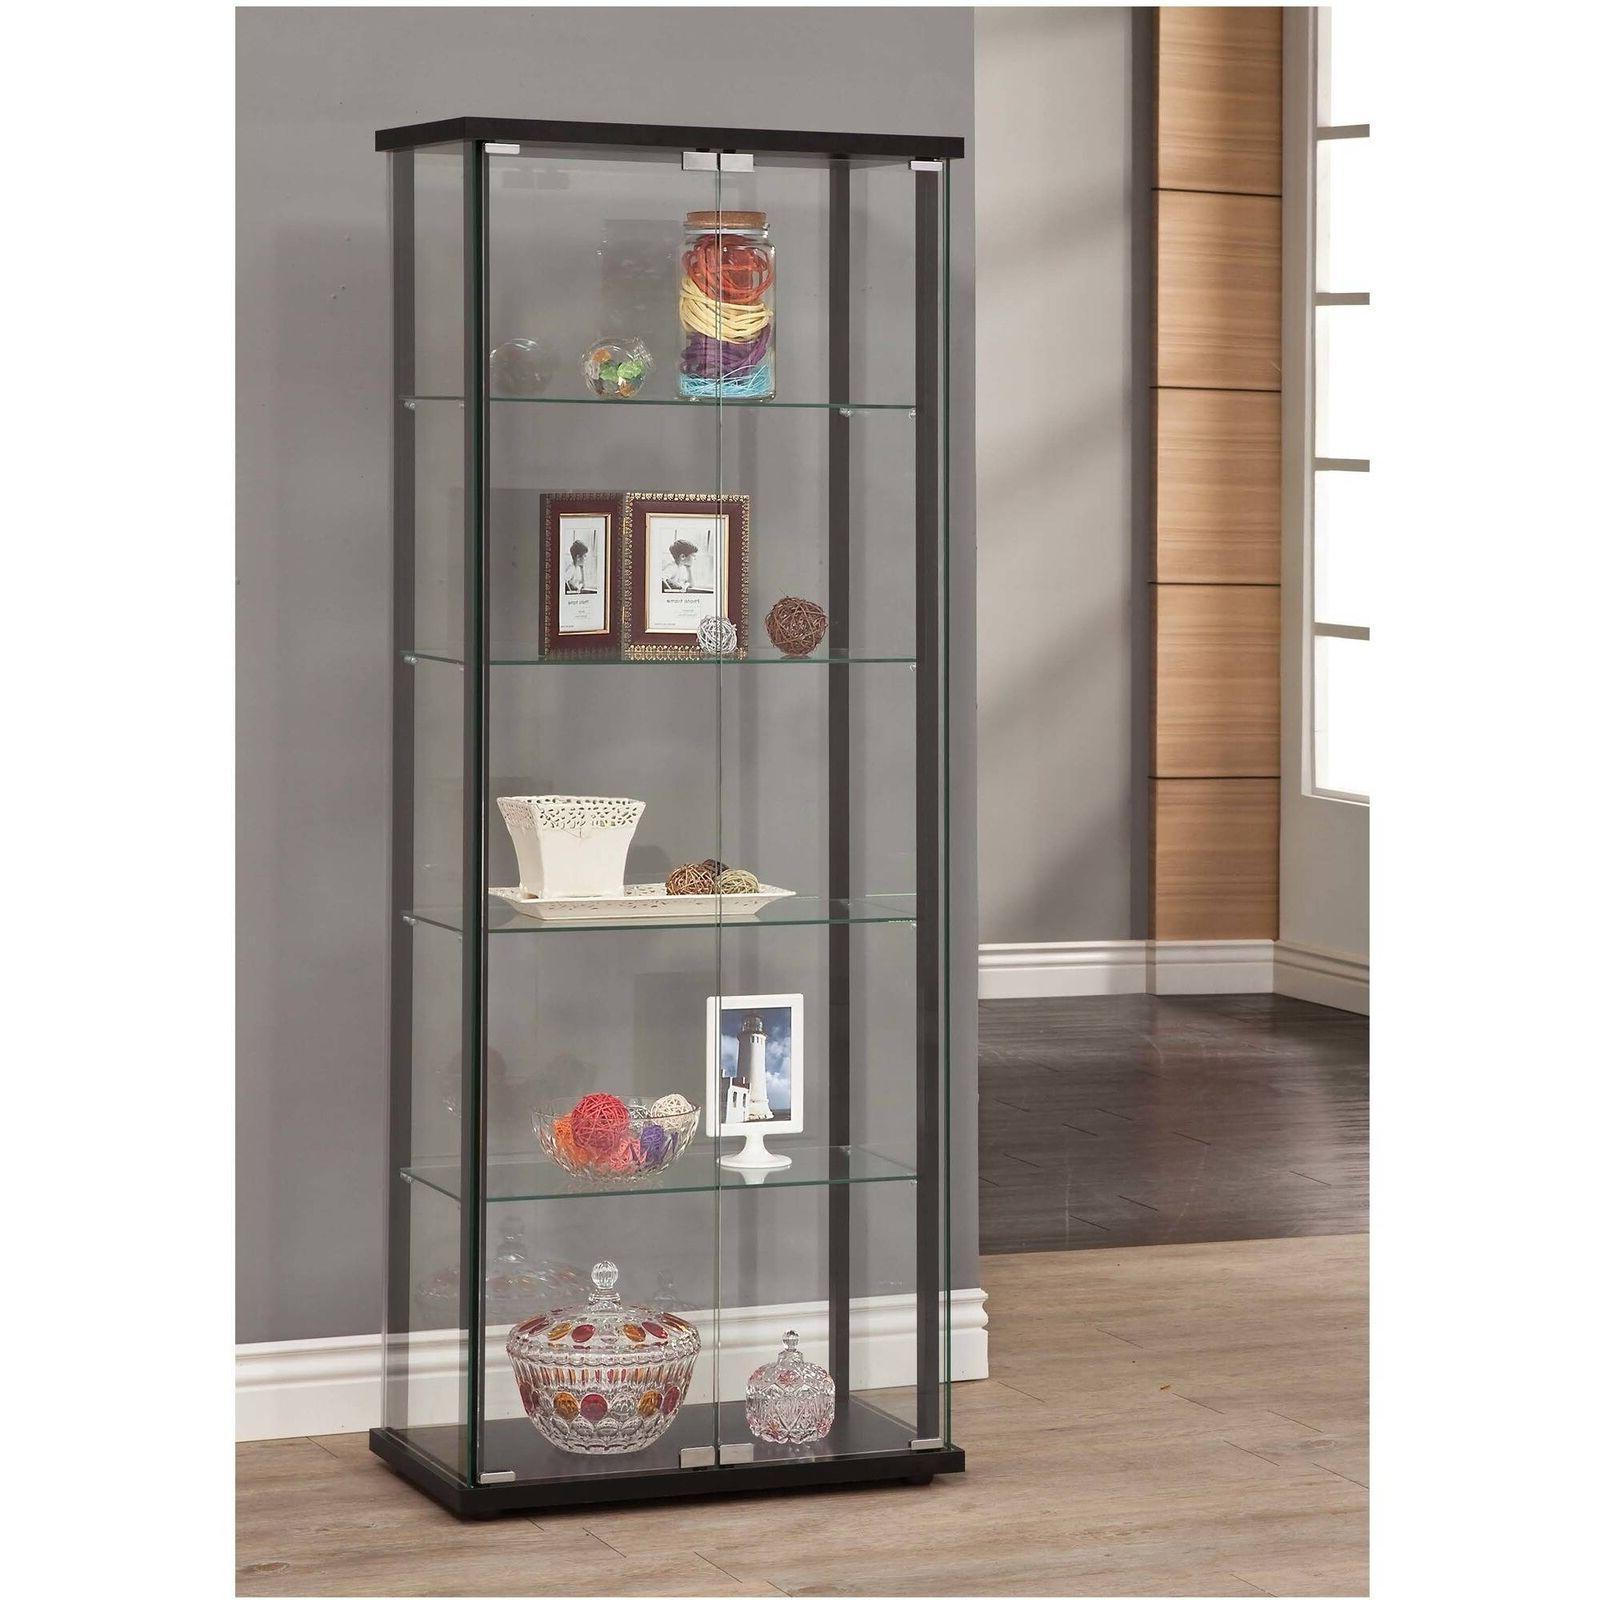 Coaster Home Furnishings 950170II Curio Cabinet Black-950170